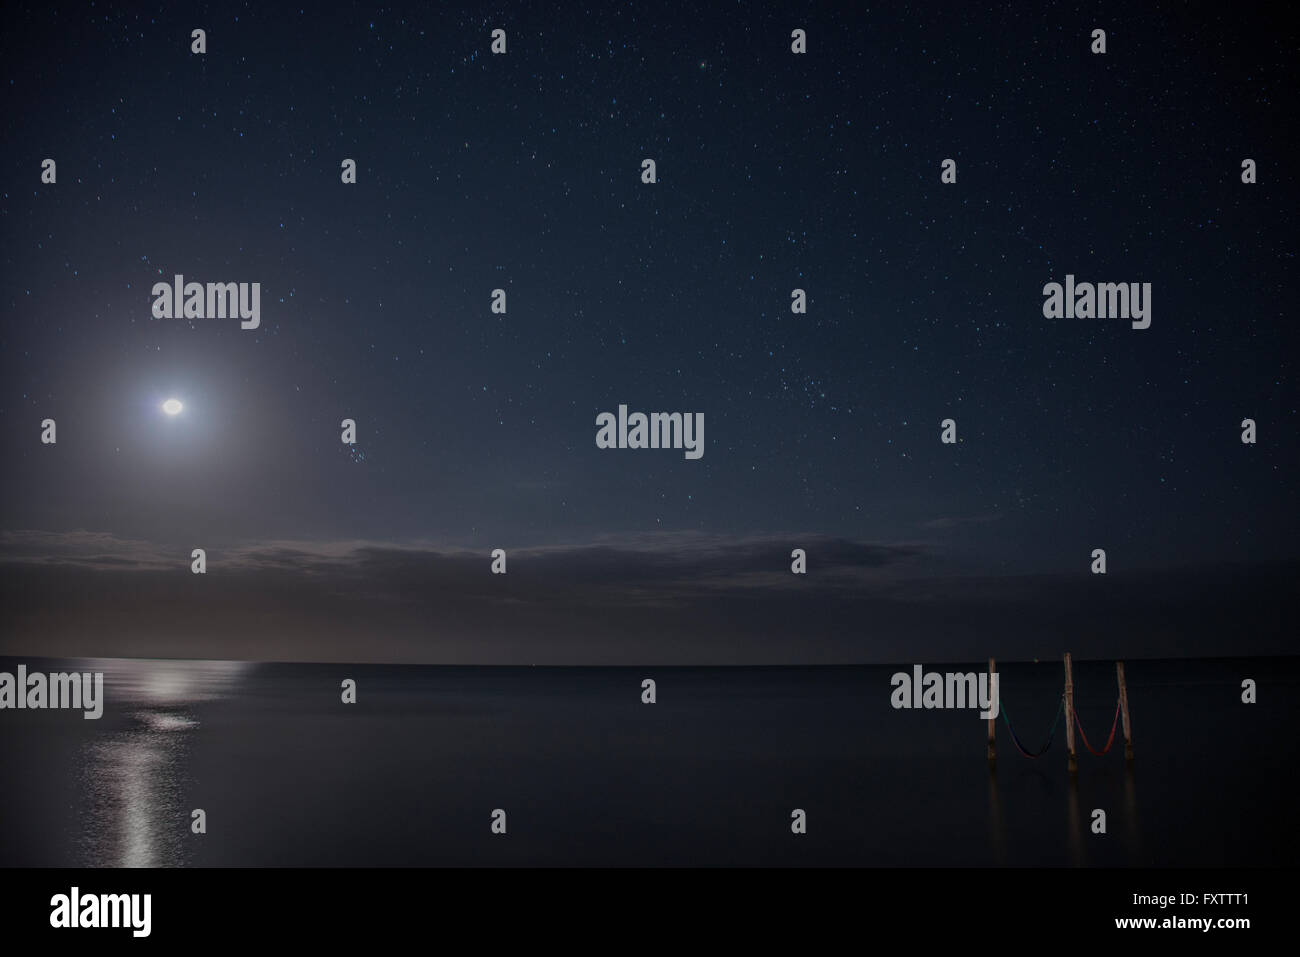 Starry sky and full moon illuminate iconic hammocks over waters, Isla Holbox, Mexico - Stock Image